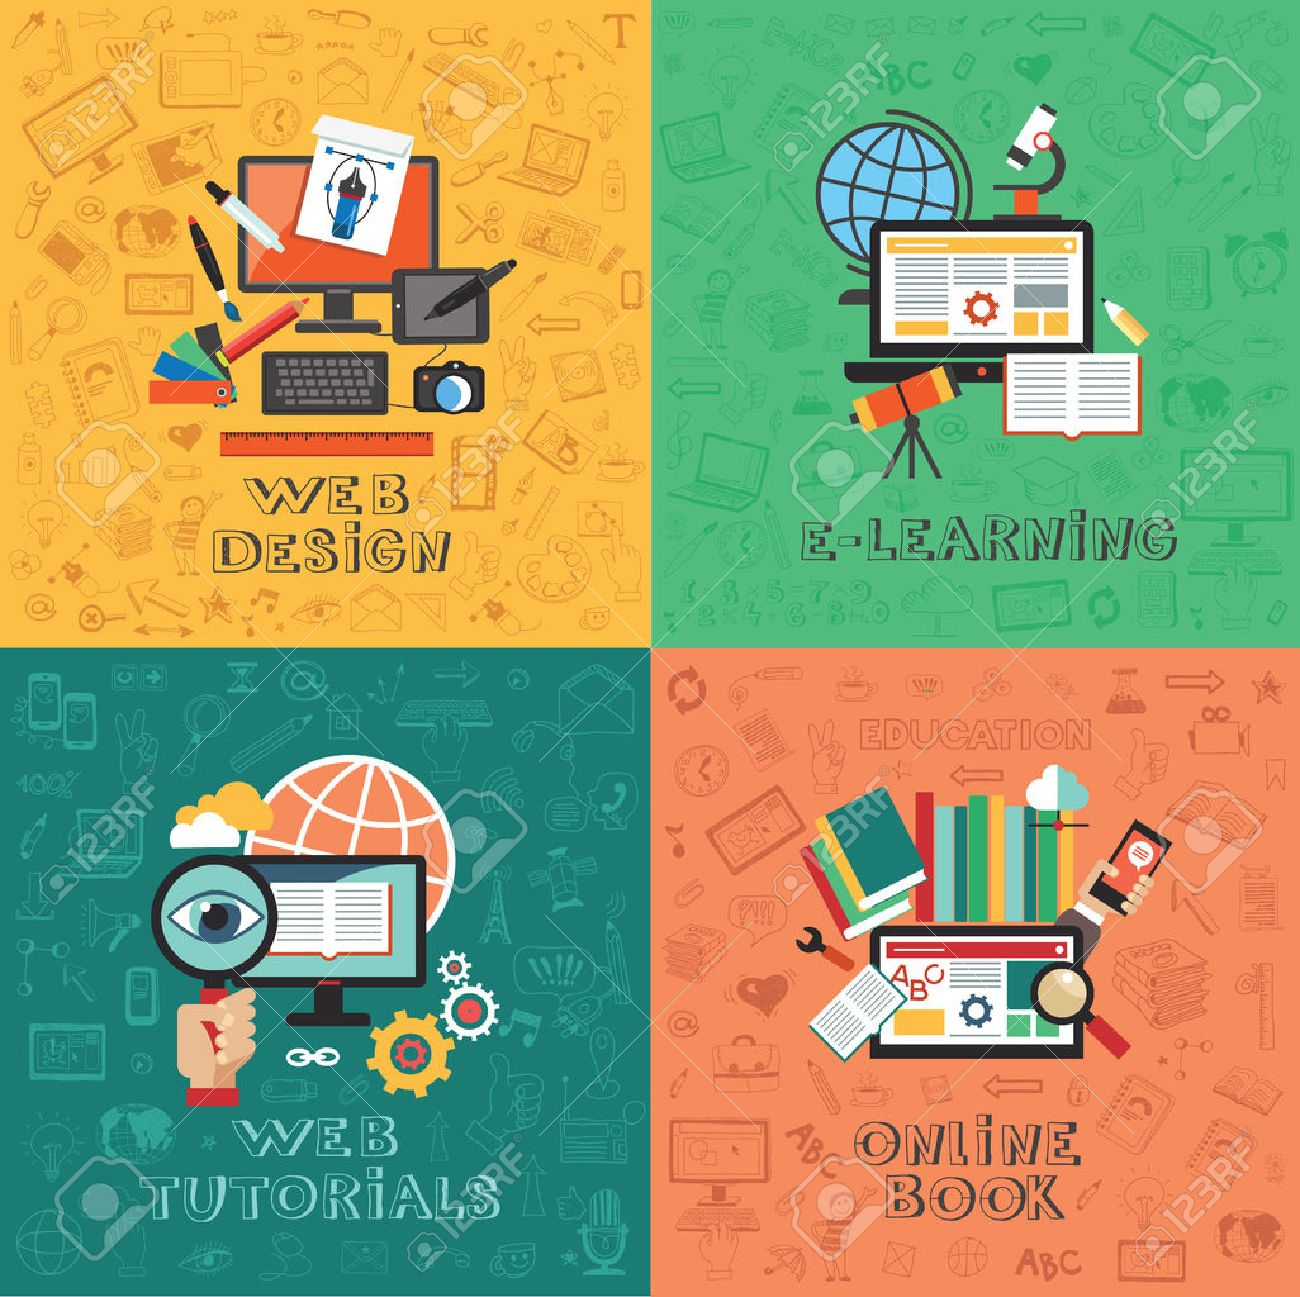 Flat vector concept education infographics. Web design. E-learning. Web tutorials. Online Book. - 46725613